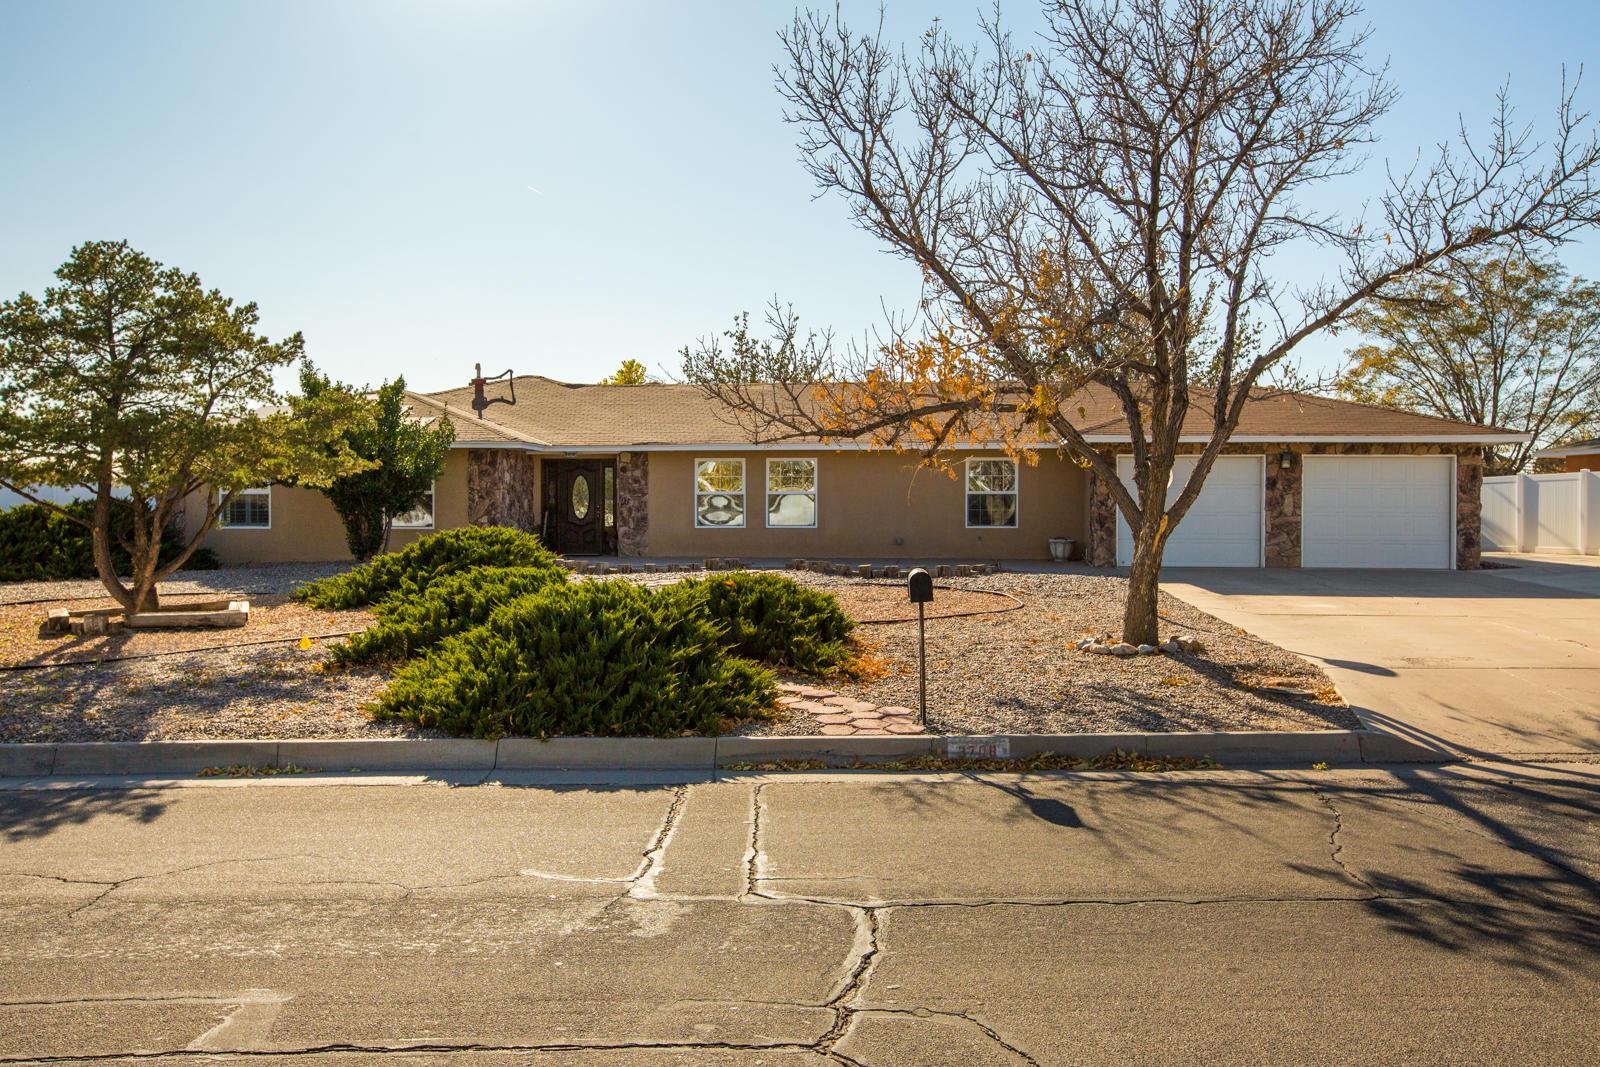 3708 SAINT ANDREWS Drive, Rio Rancho NM 87124